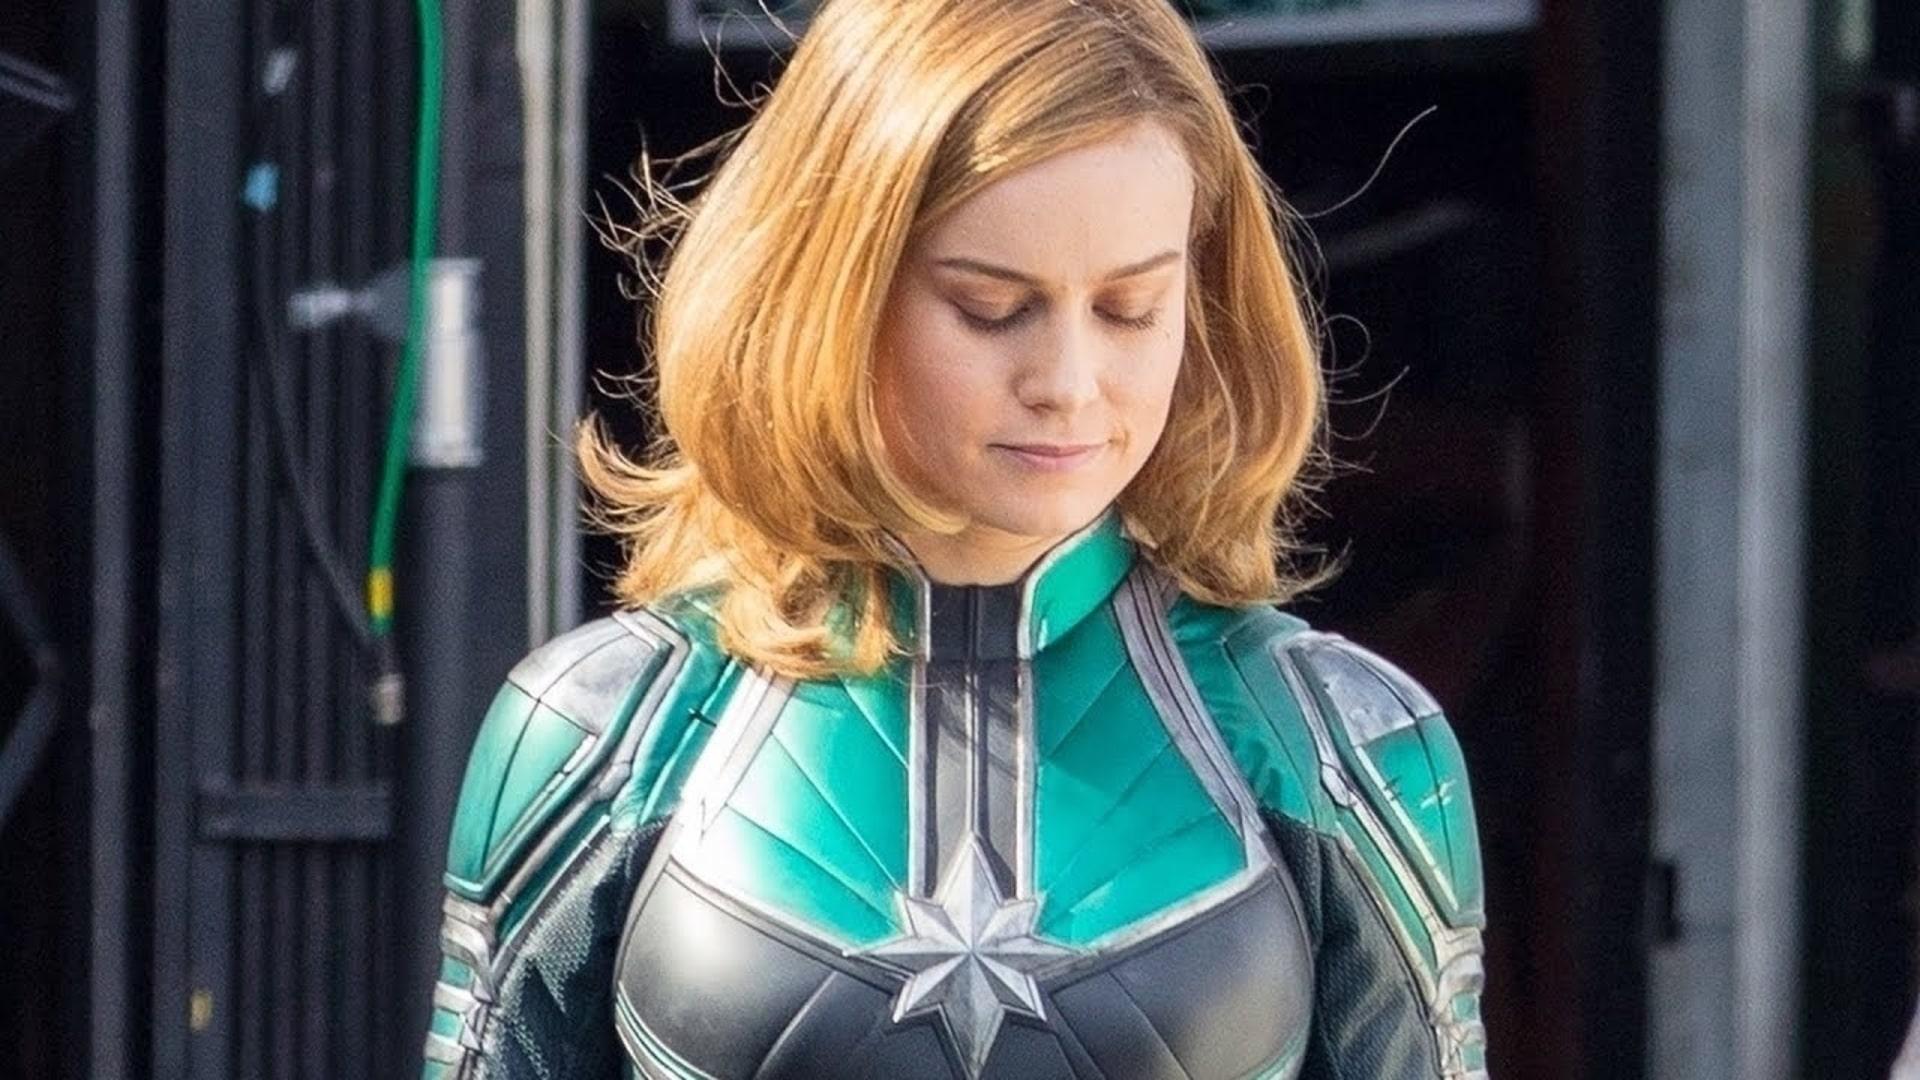 Captain Marvel's initial costume in teel